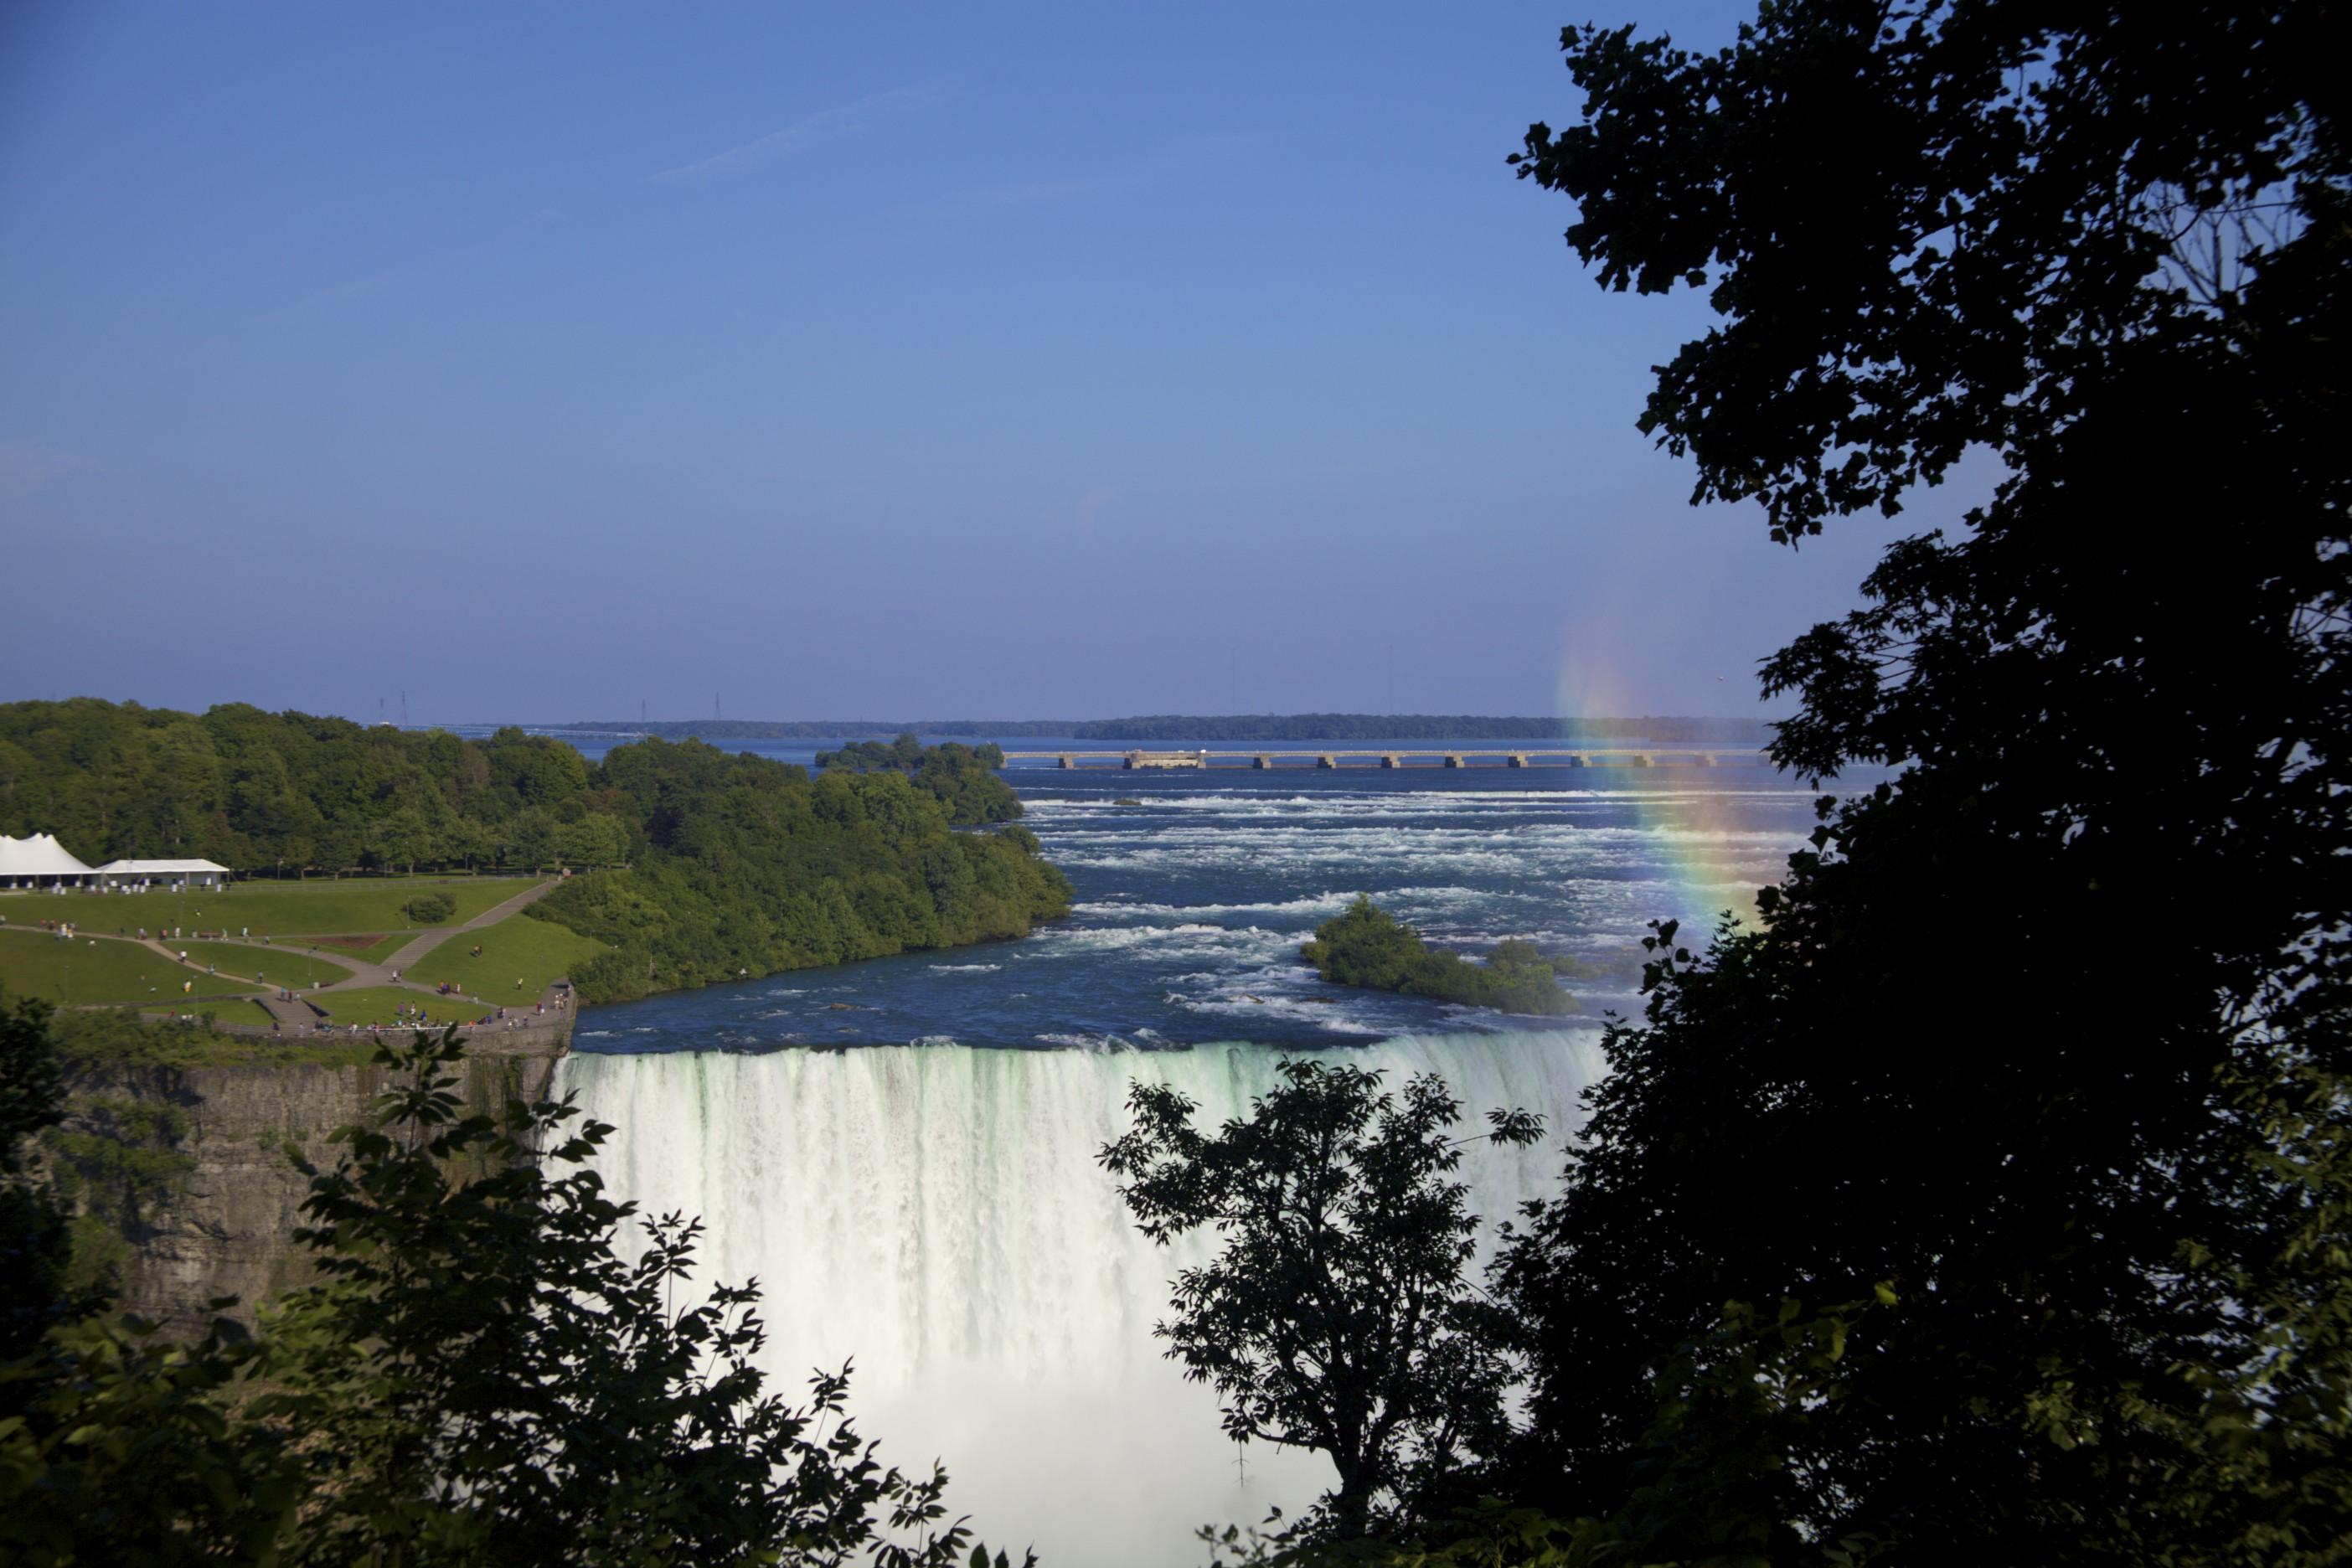 American Falls @ Niagara